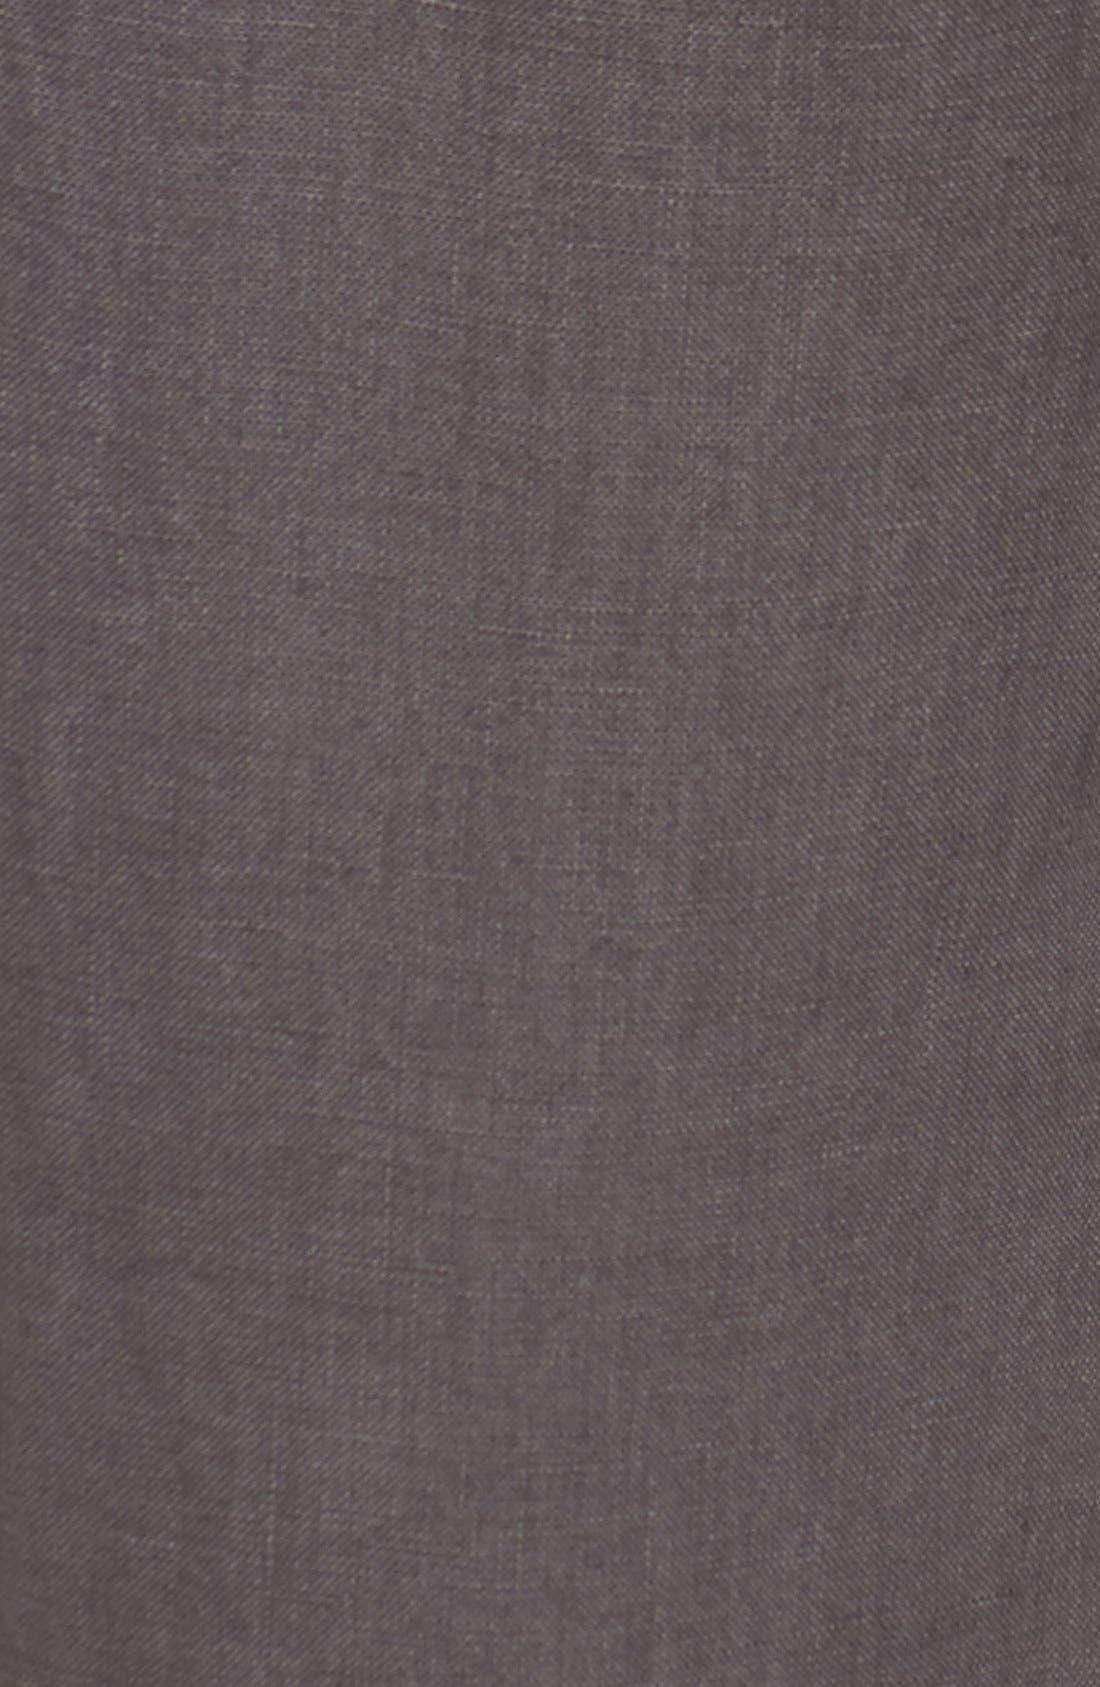 Crop Linen Joggers,                             Alternate thumbnail 4, color,                             Grey Ebony